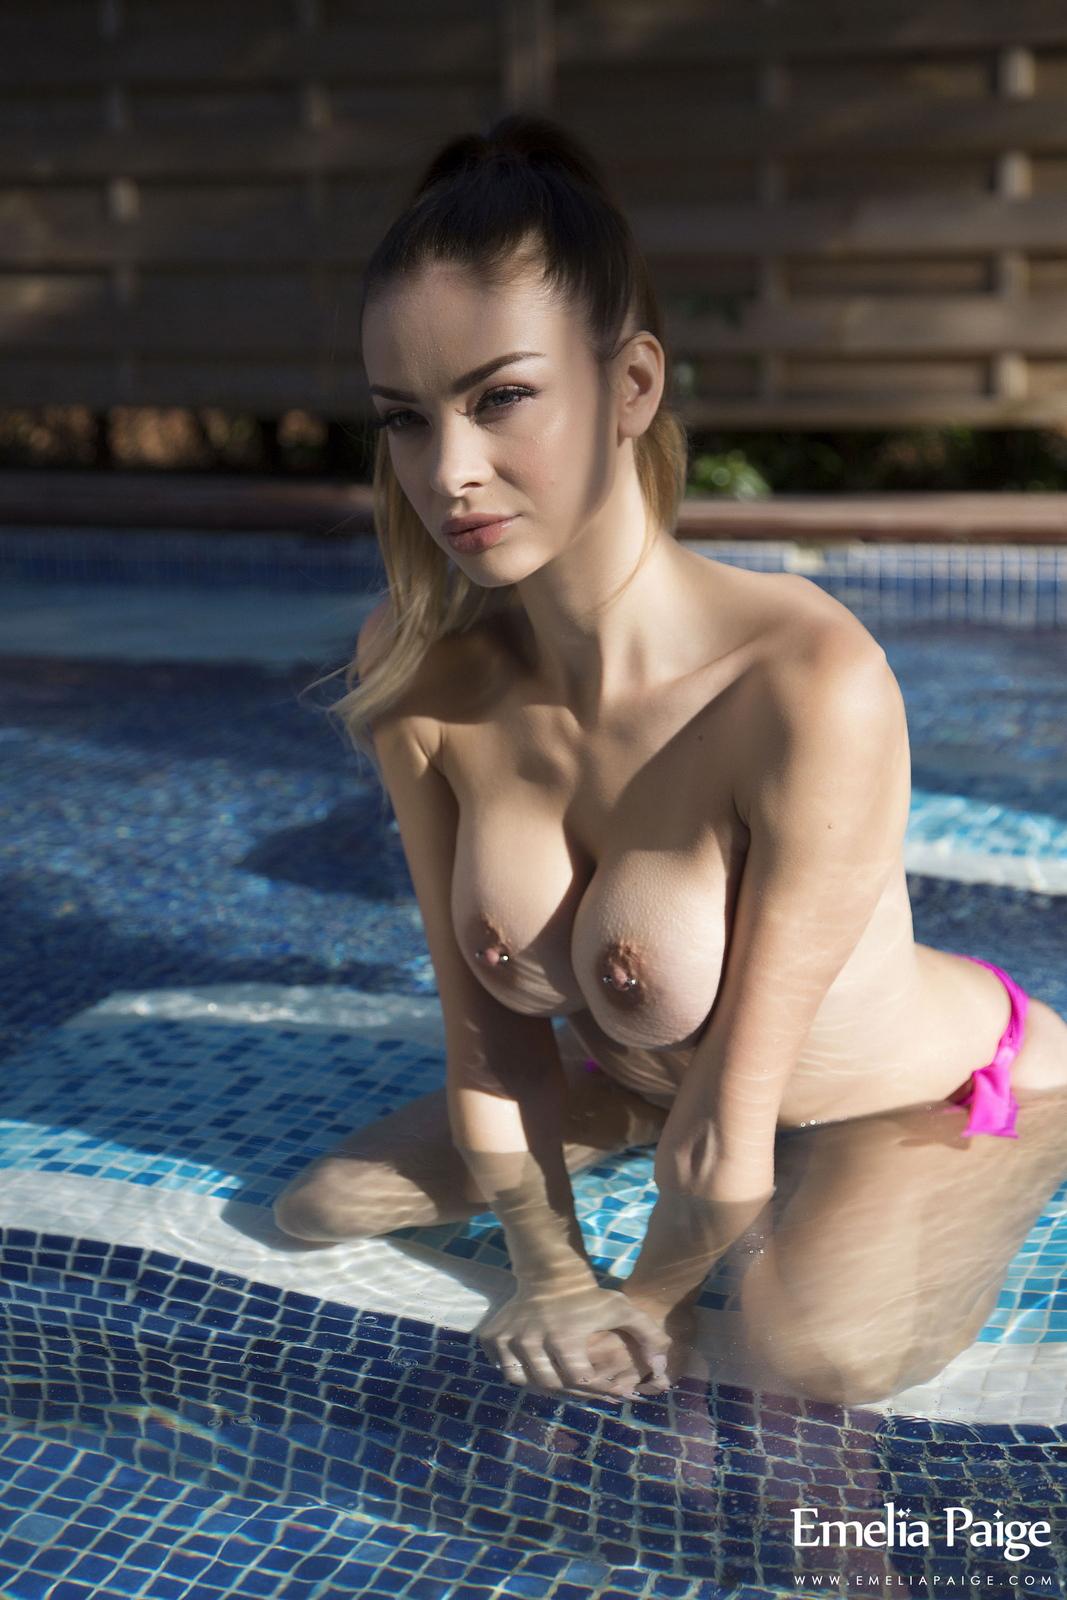 emelia-paige-pool-tits-naked-pink-bikini-wet-22